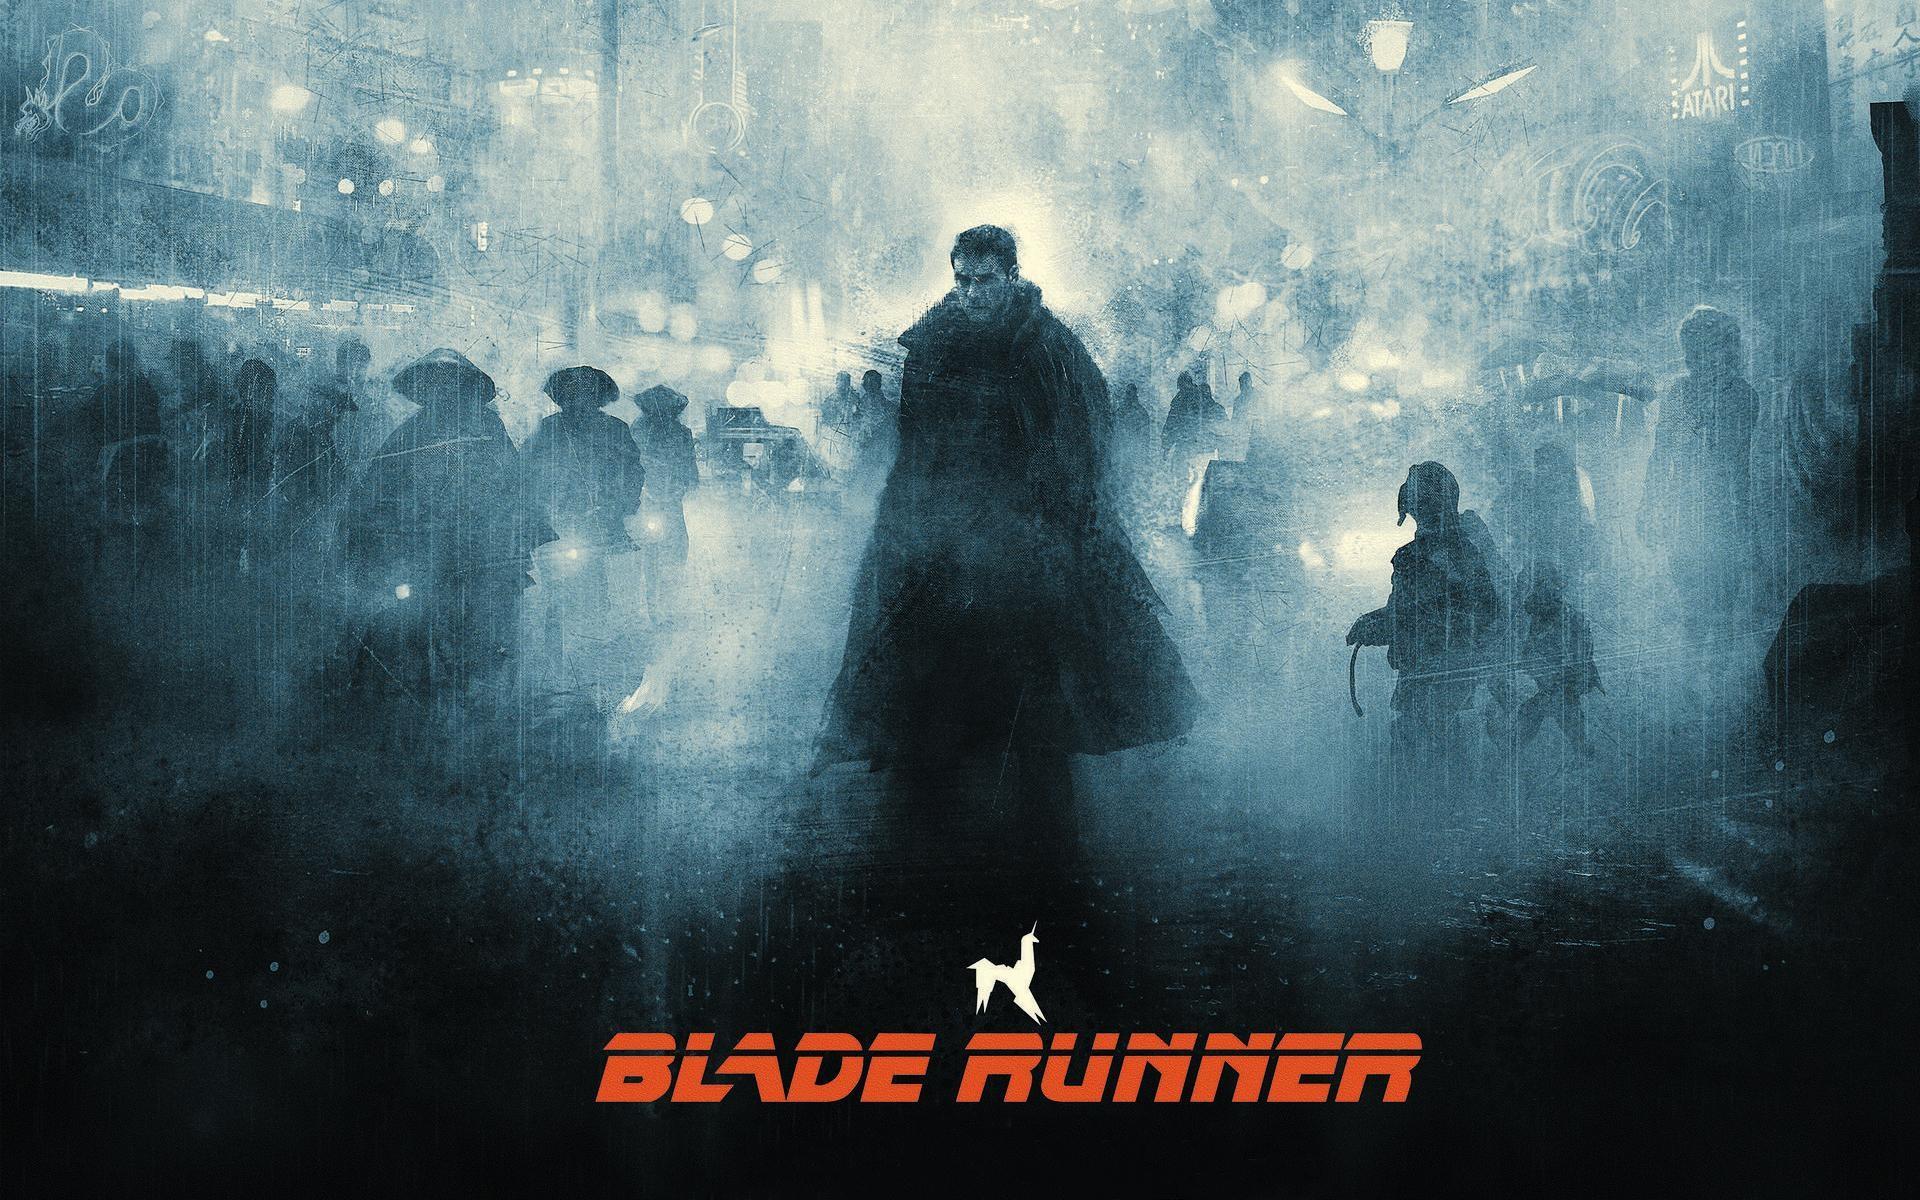 Blade Runner 2049 wallpapers (29 Wallpapers) - Adorable ...